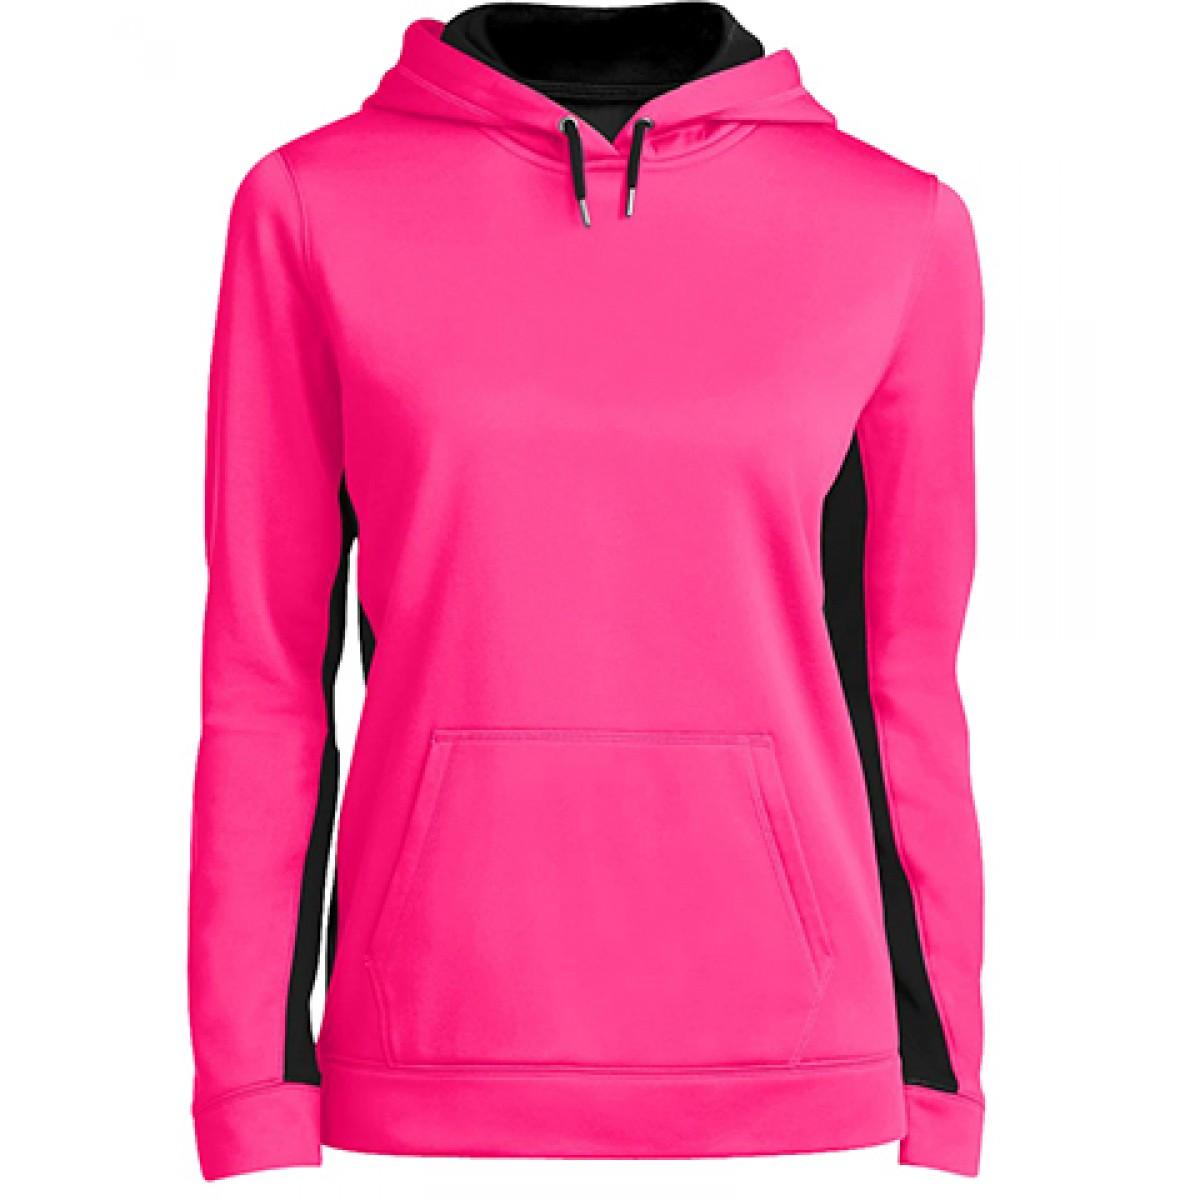 Ladies Colorblock Hooded Pullover